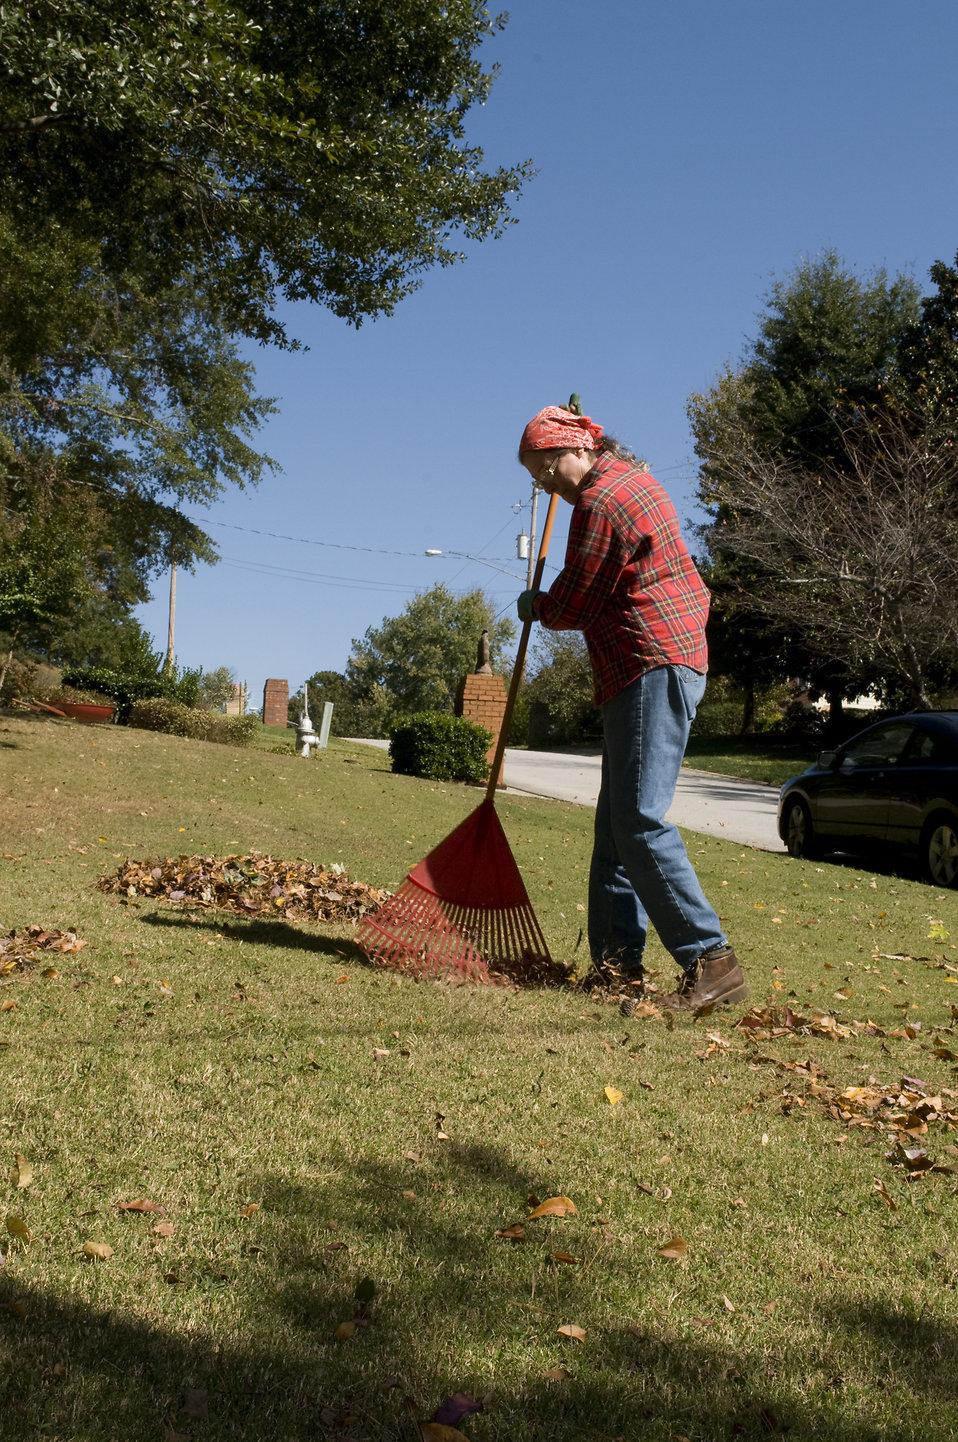 Rake Woman | Free Stock Photo | A woman raking leaves on